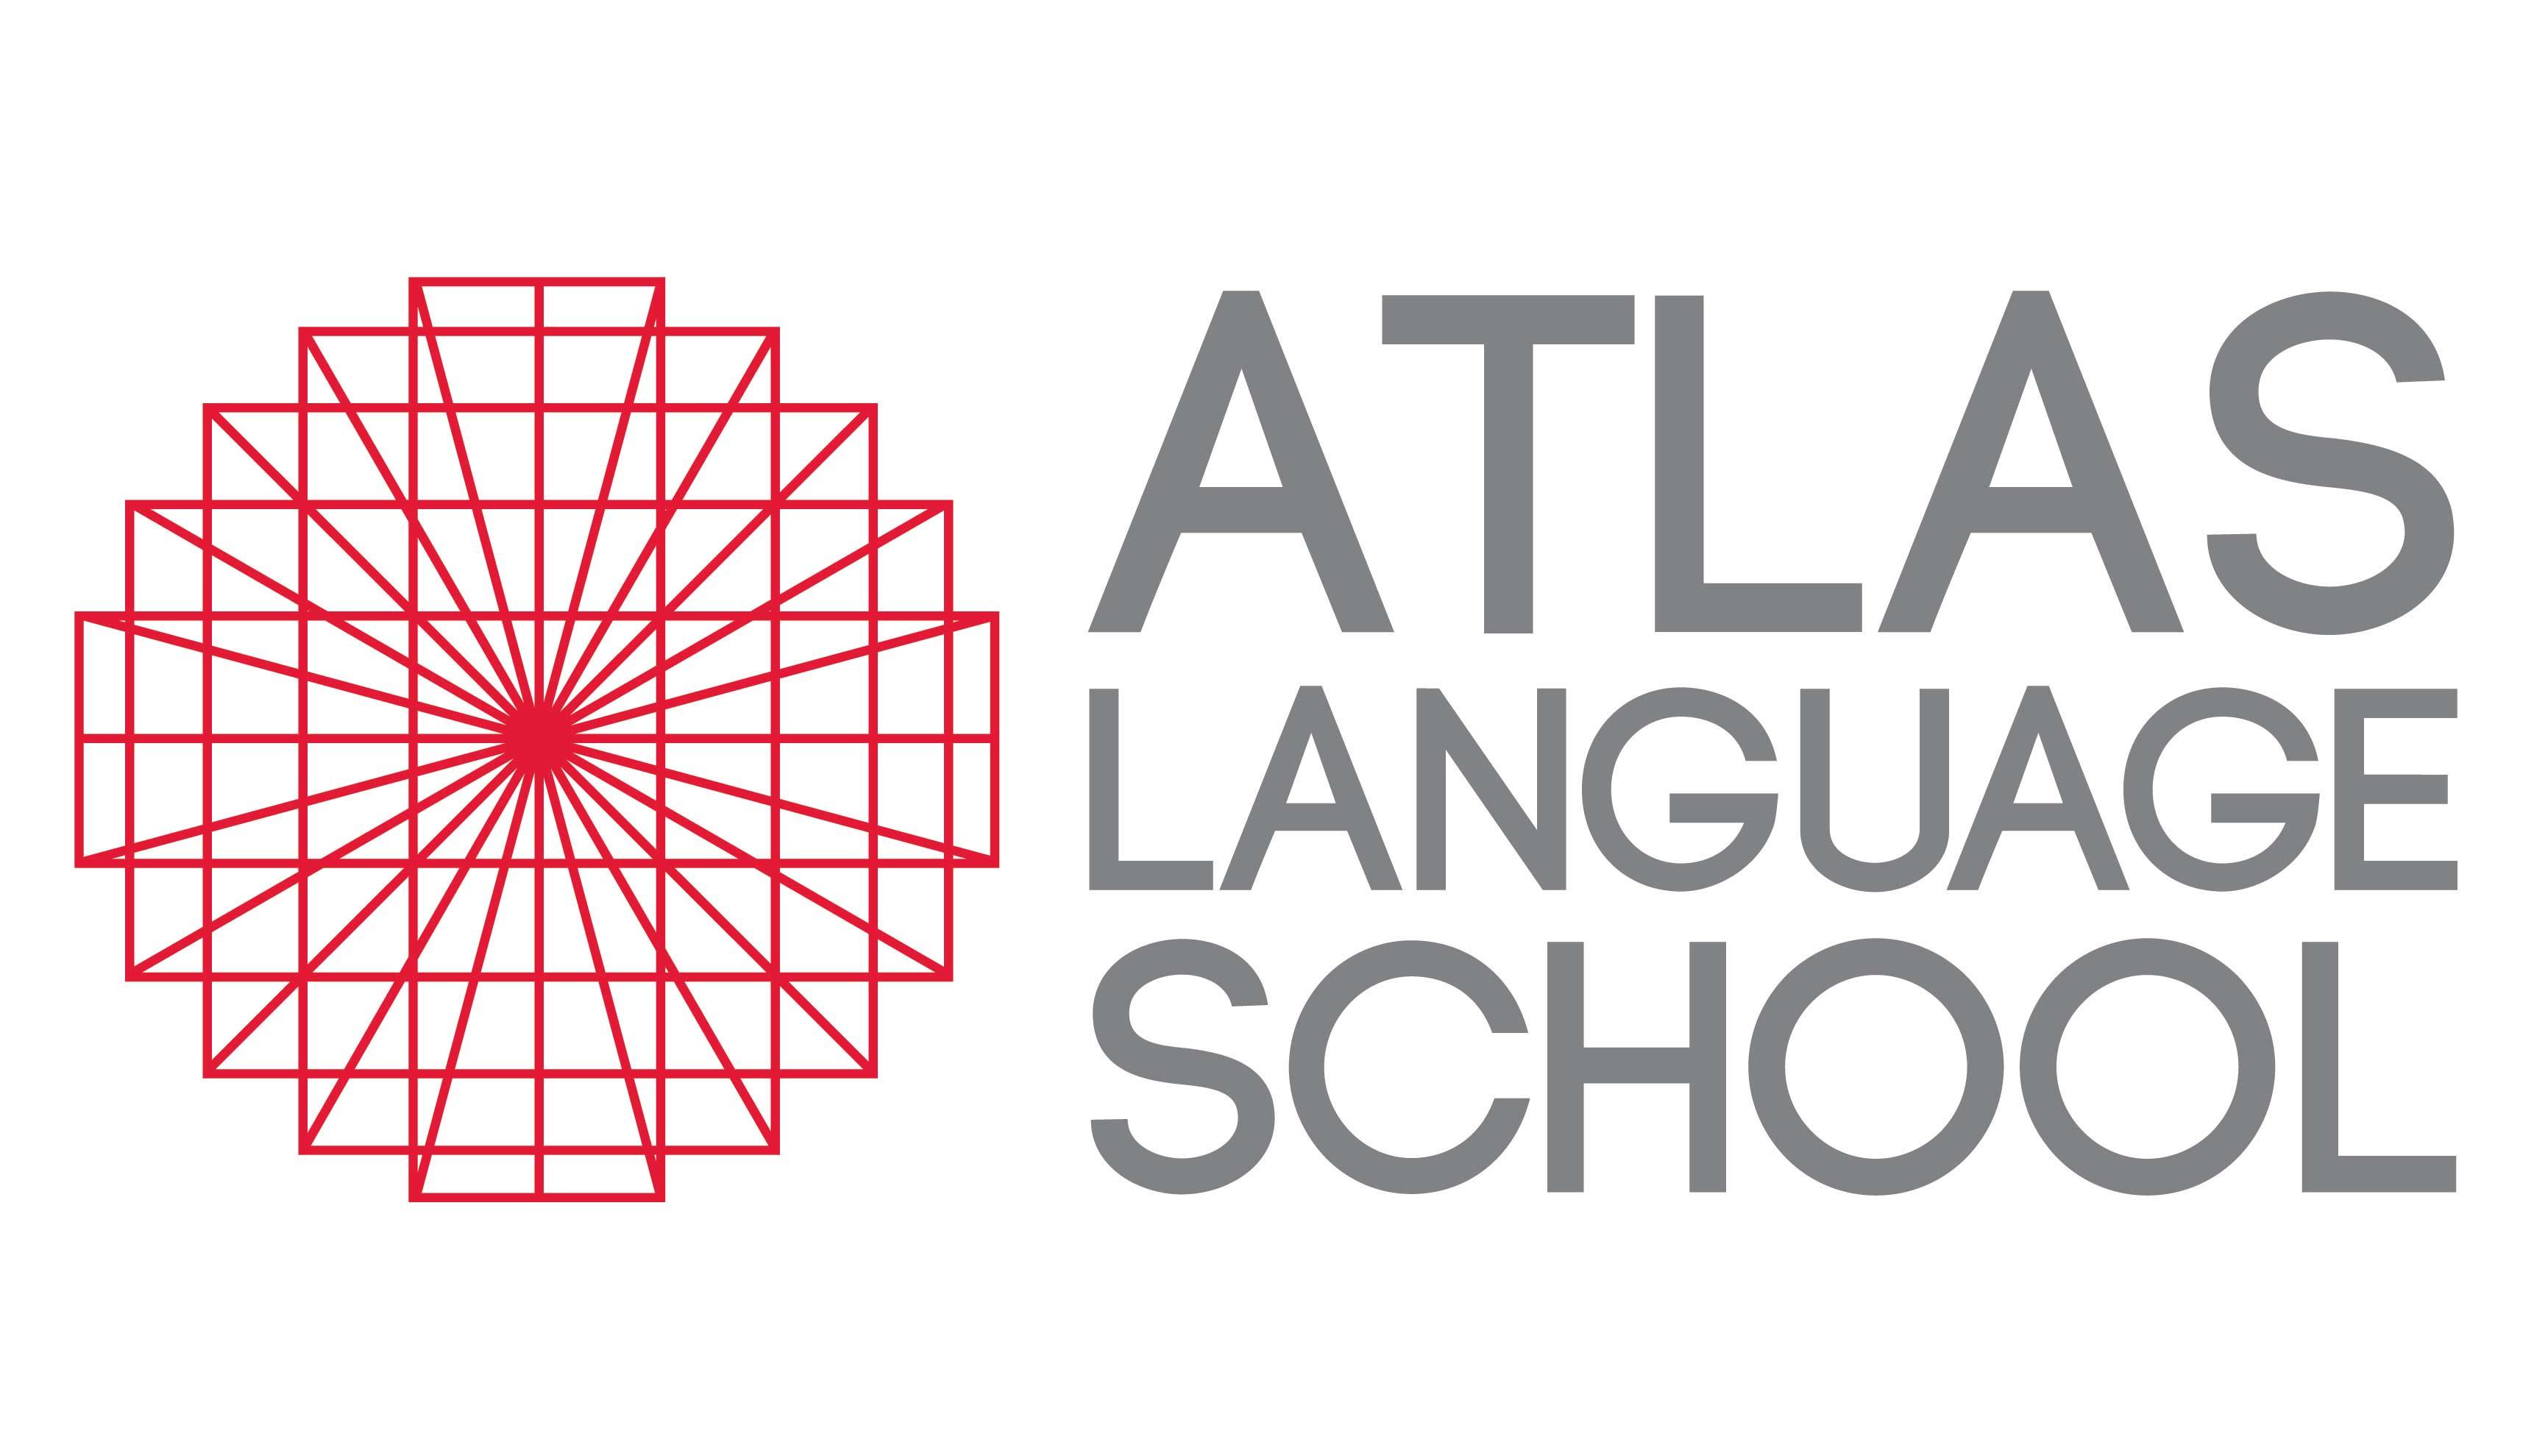 atlas language school logo ile ilgili görsel sonucu